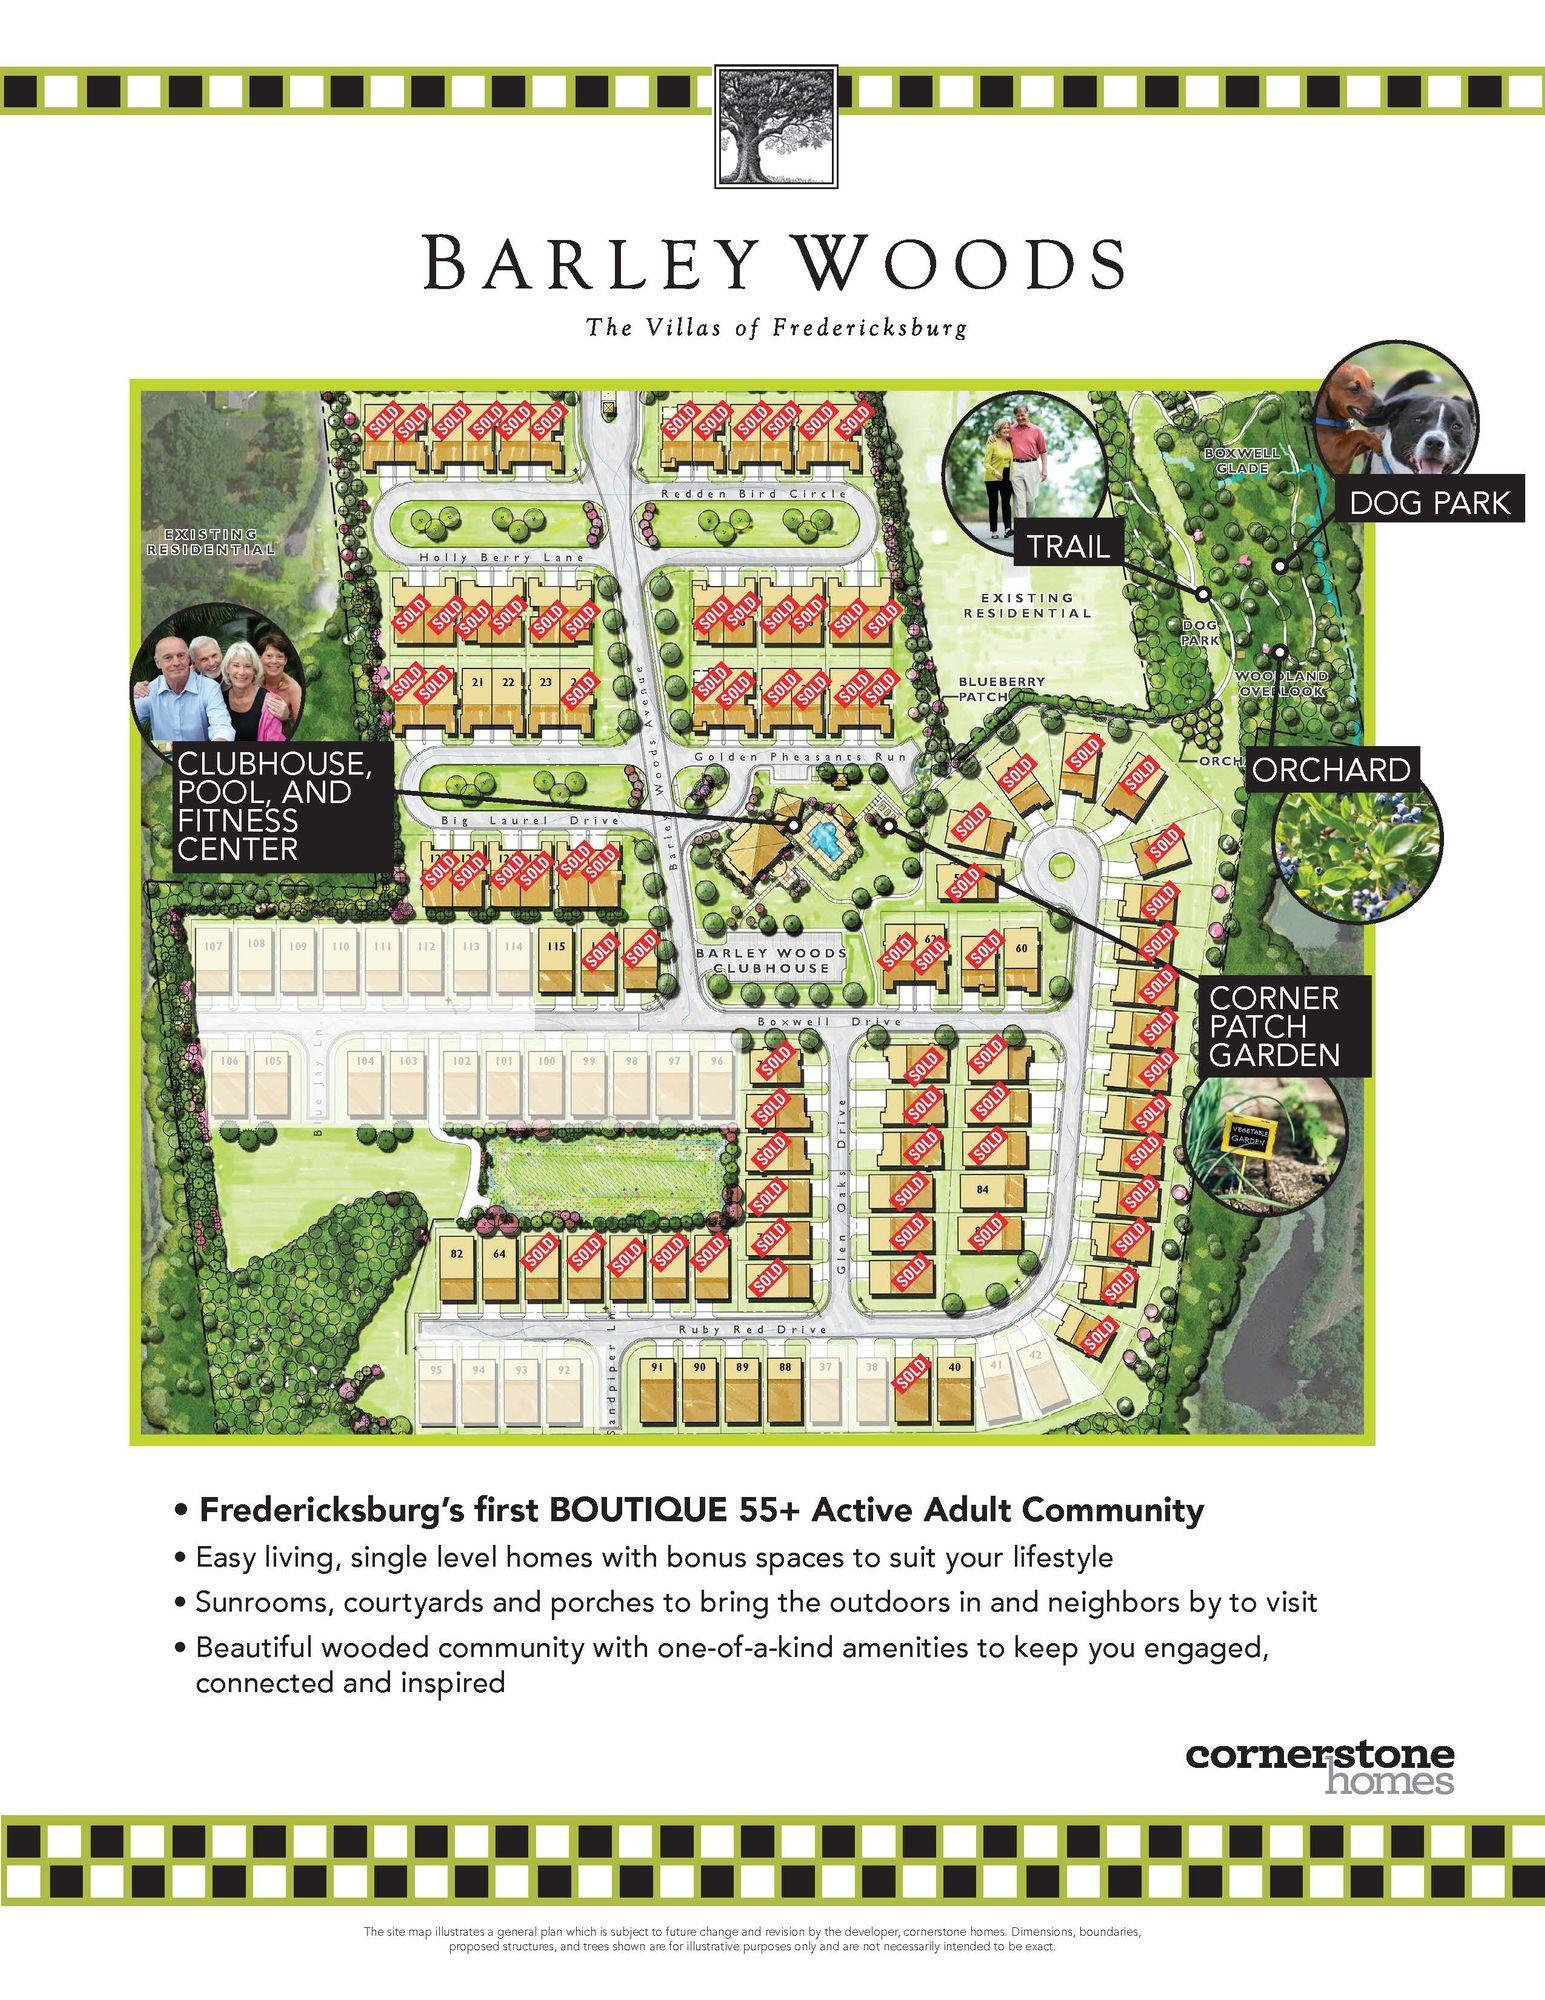 Barley Woods - The Villas of Fredericksburg